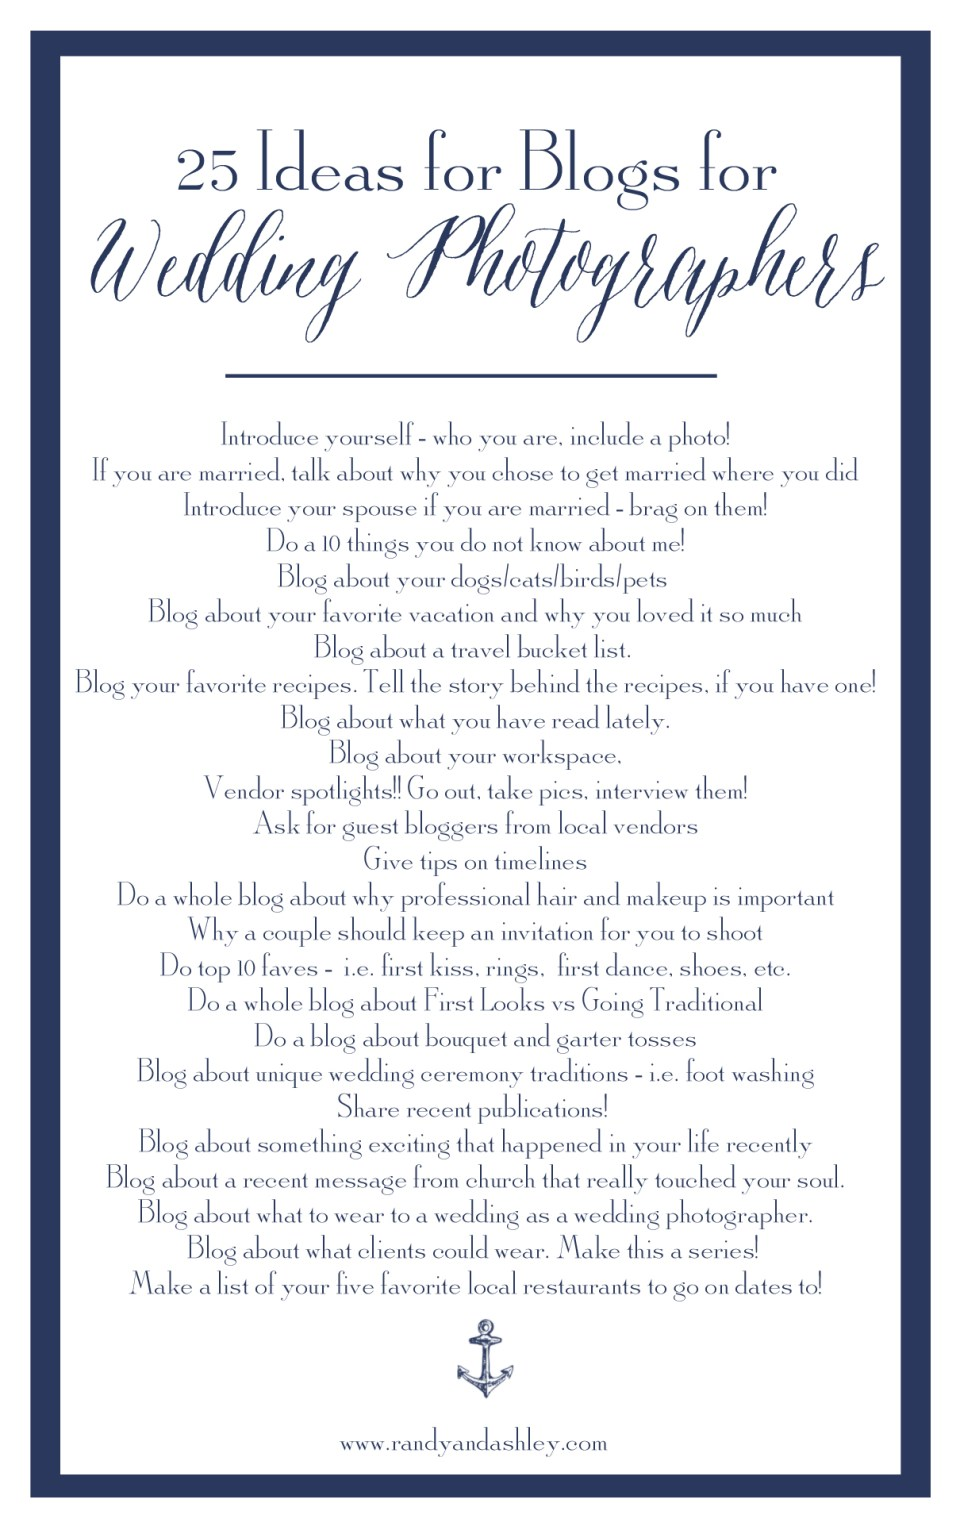 25 blogging ideas, photography blogging ideas, wedding blog ideas